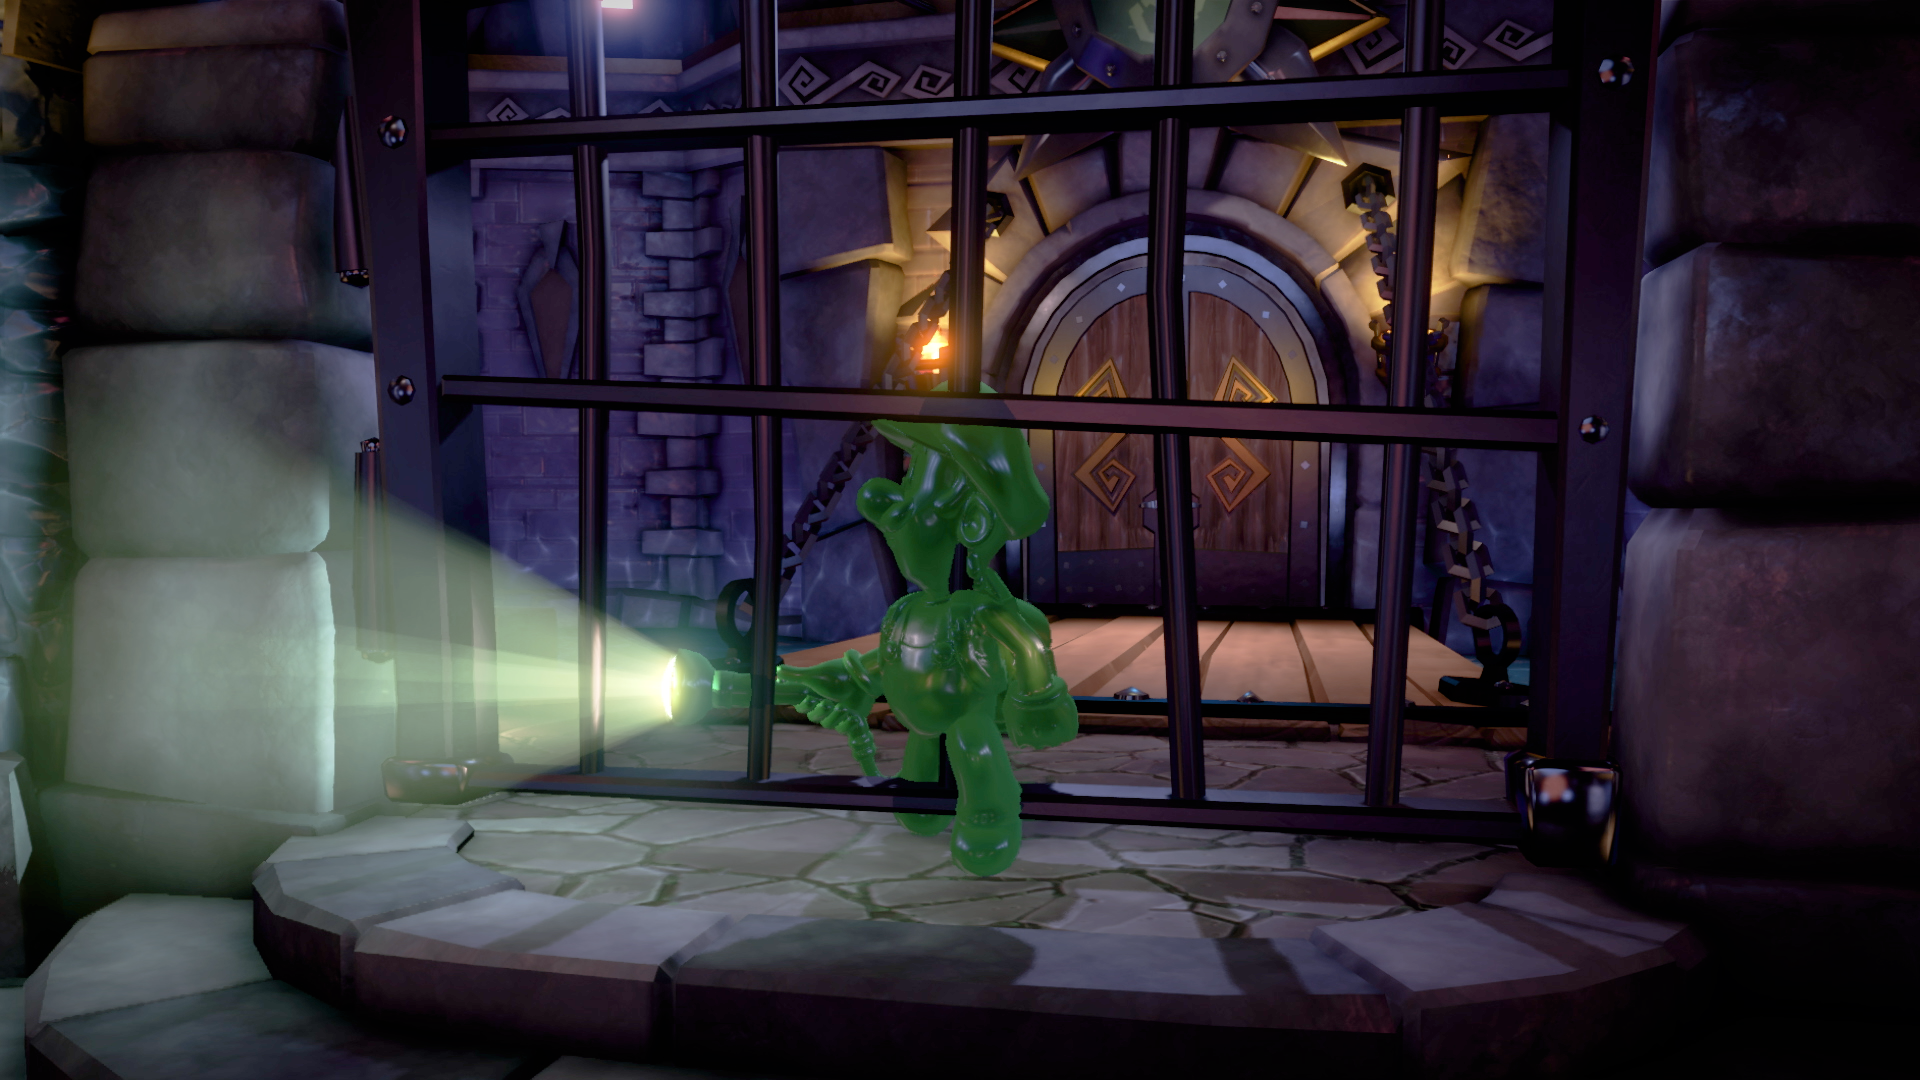 Luigi S Mansion 3 Video Game Review The Washington Post